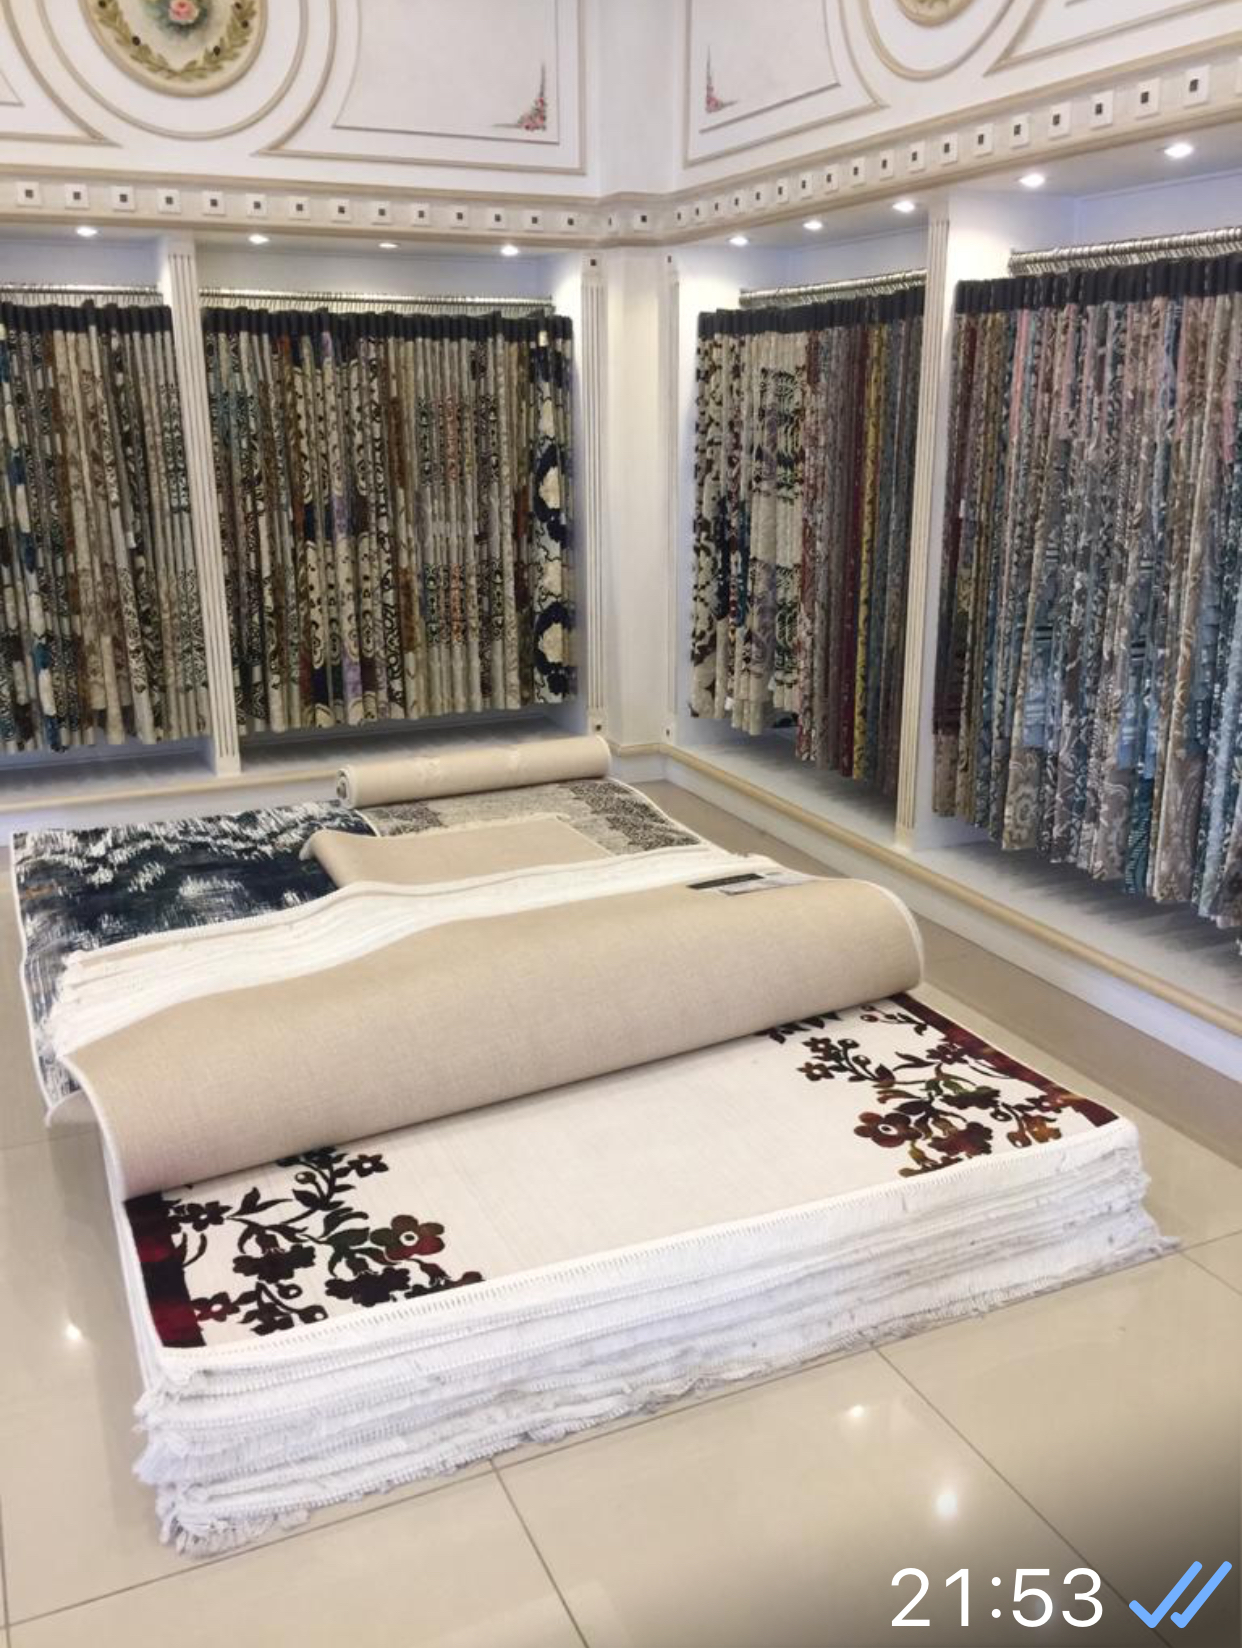 prayer rug, prayer supplies, carpet, rug,seccade